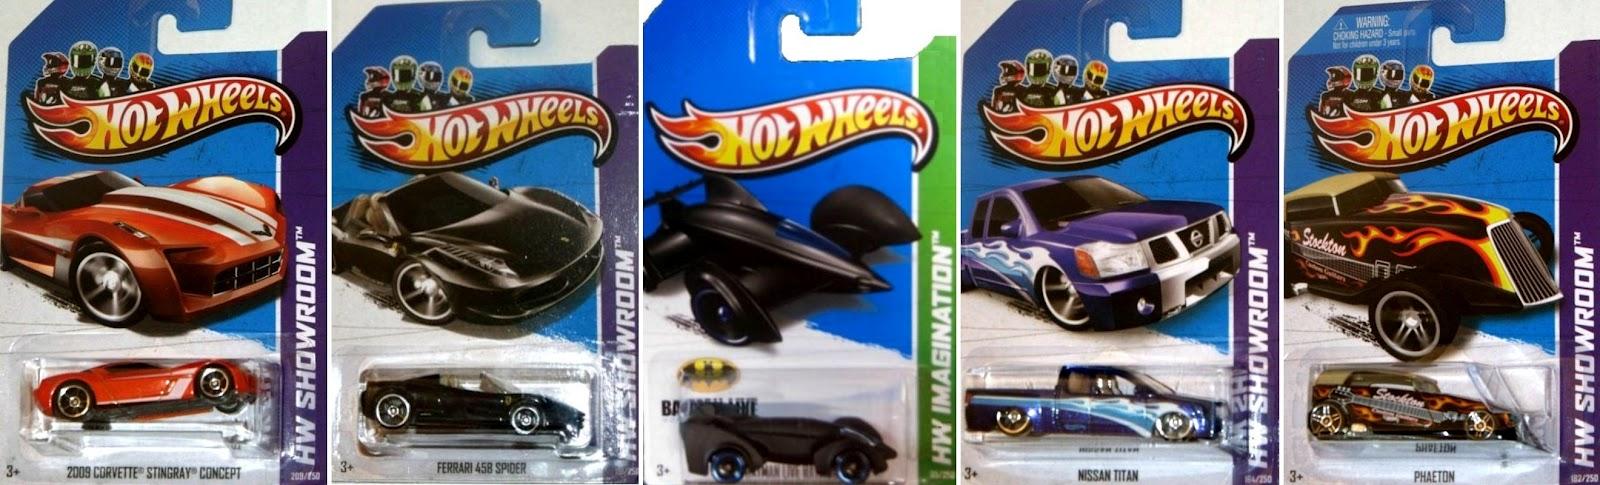 monday 17 september 2012 hot wheels - Hot Wheels Cars 2012